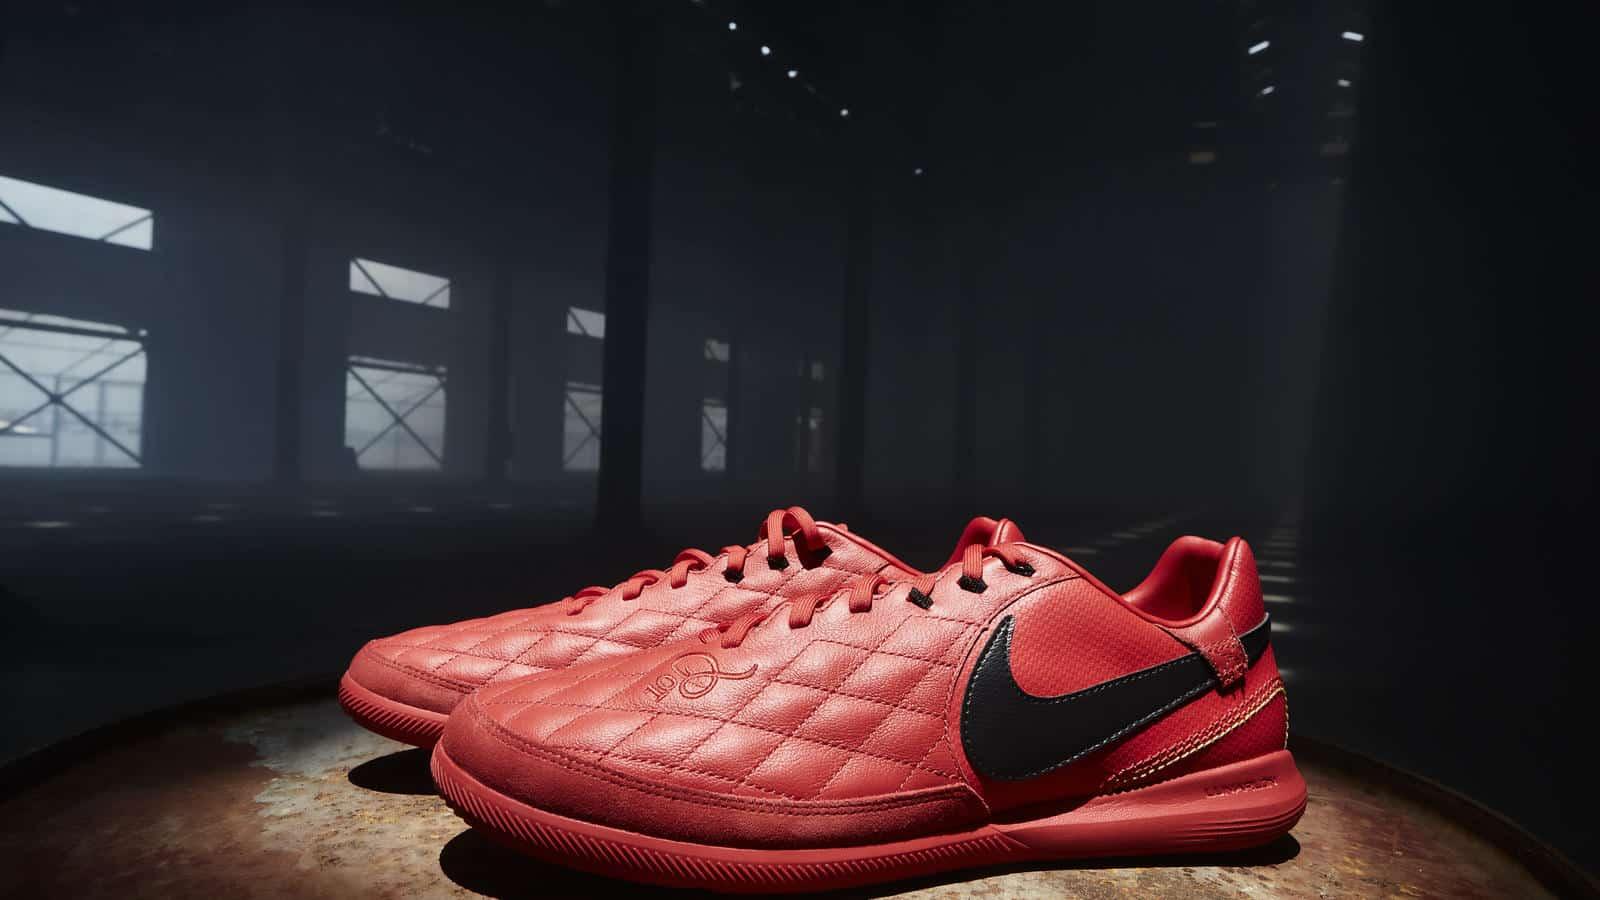 chaussures-football-Nike-Tiempo-X-10R-Milan-img5